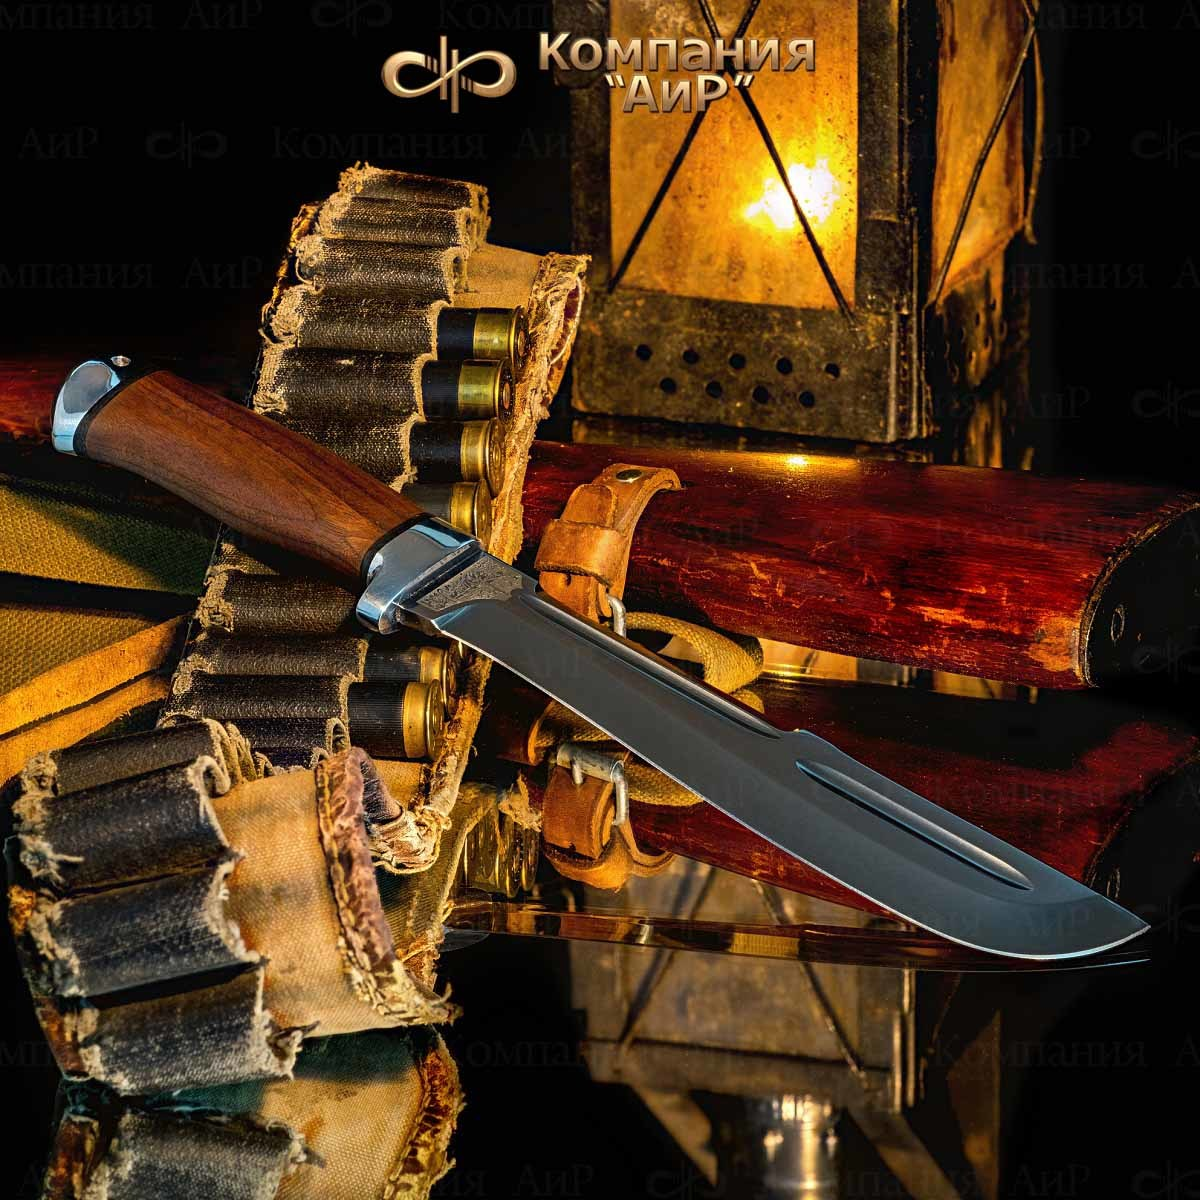 Мачете разделочный АиР Ицыл мачете, сталь 100х13м, рукоять дерево мачете zombie killer